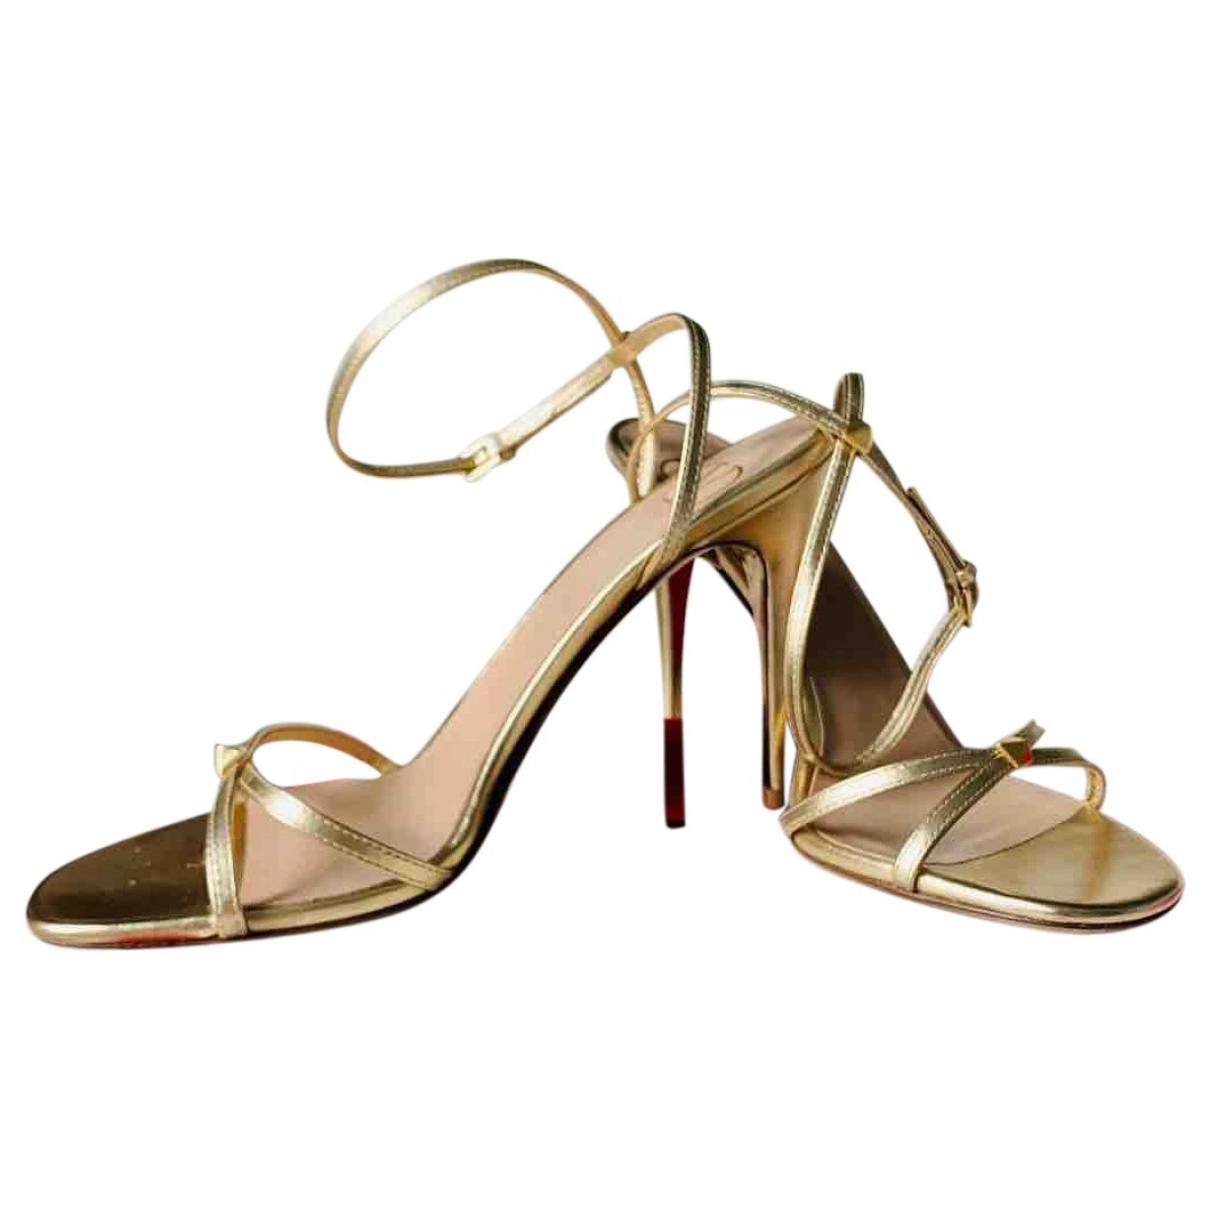 Valentino Garavani N Gold Leather Sandals for Women 37 EU